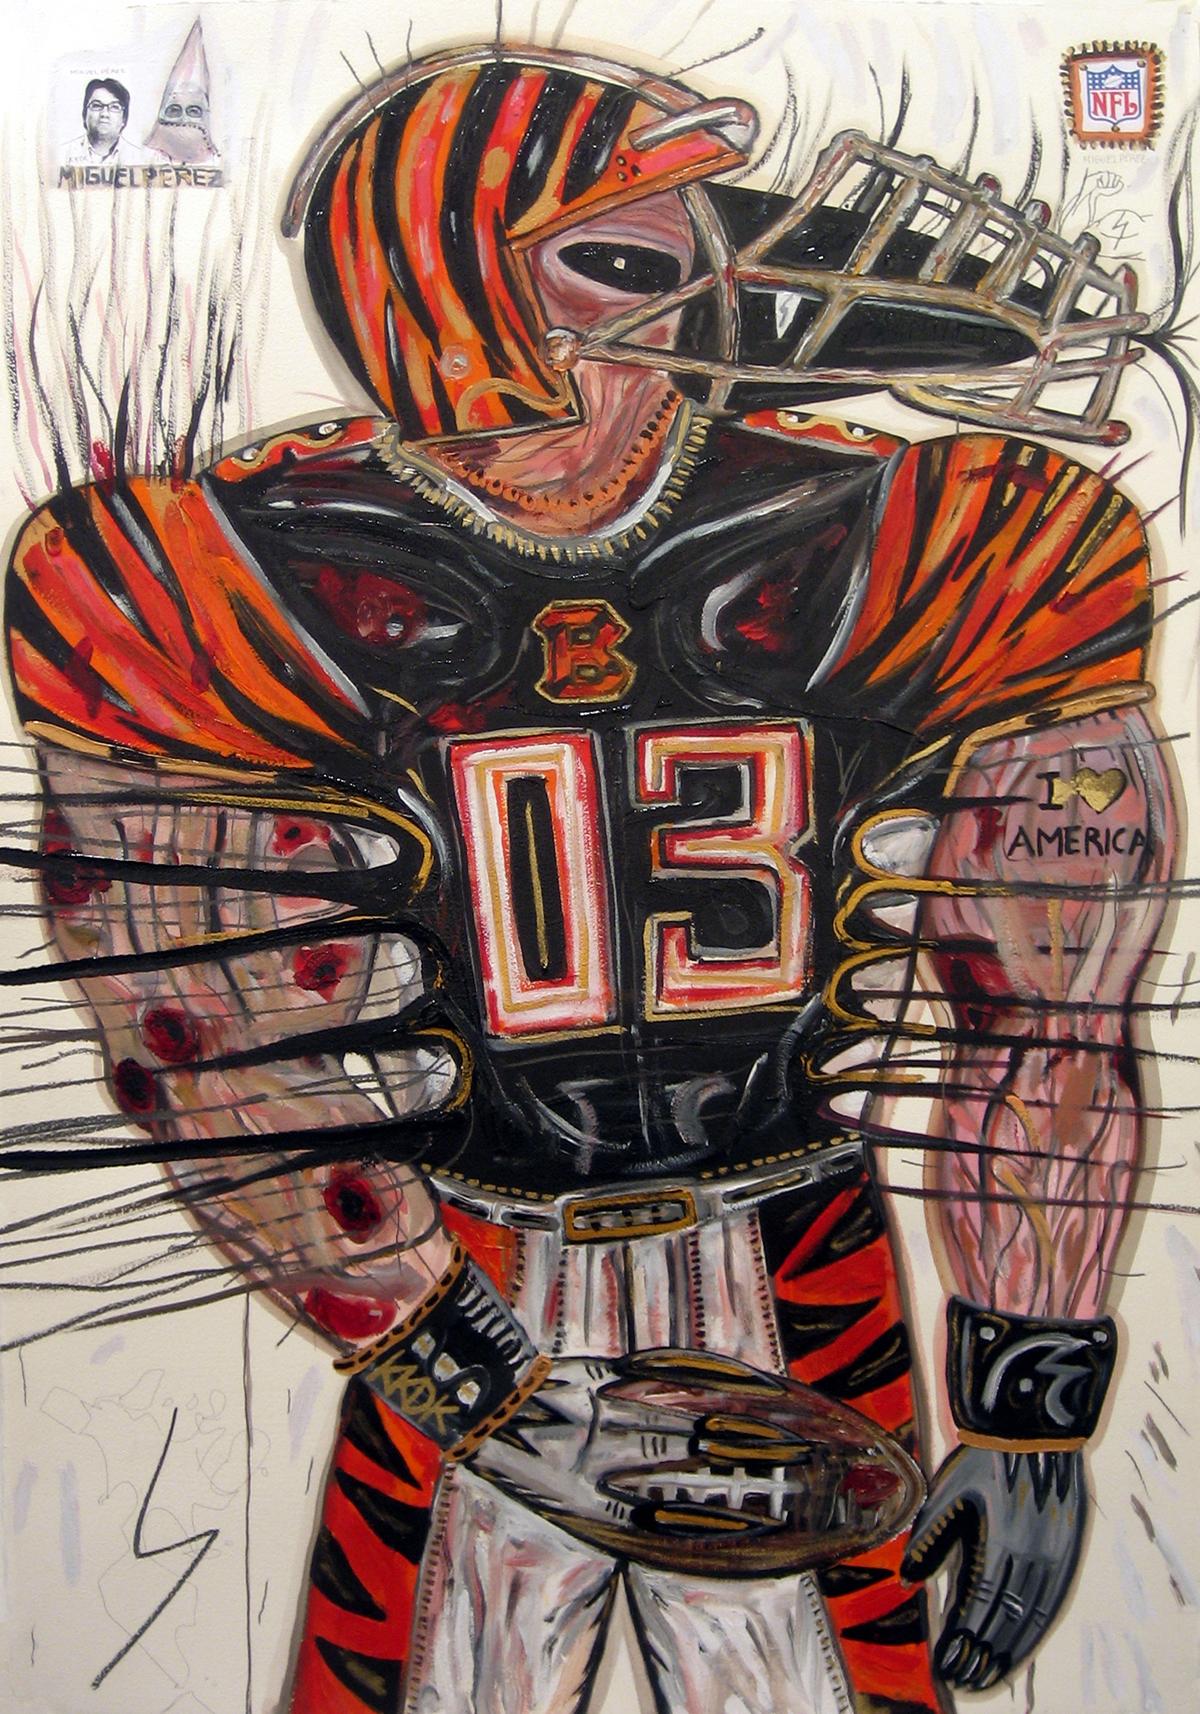 Abdul Vas. The Texas Chainsaw Massacre + Cincinnati Reds. Cincinnati Bengals, 2005